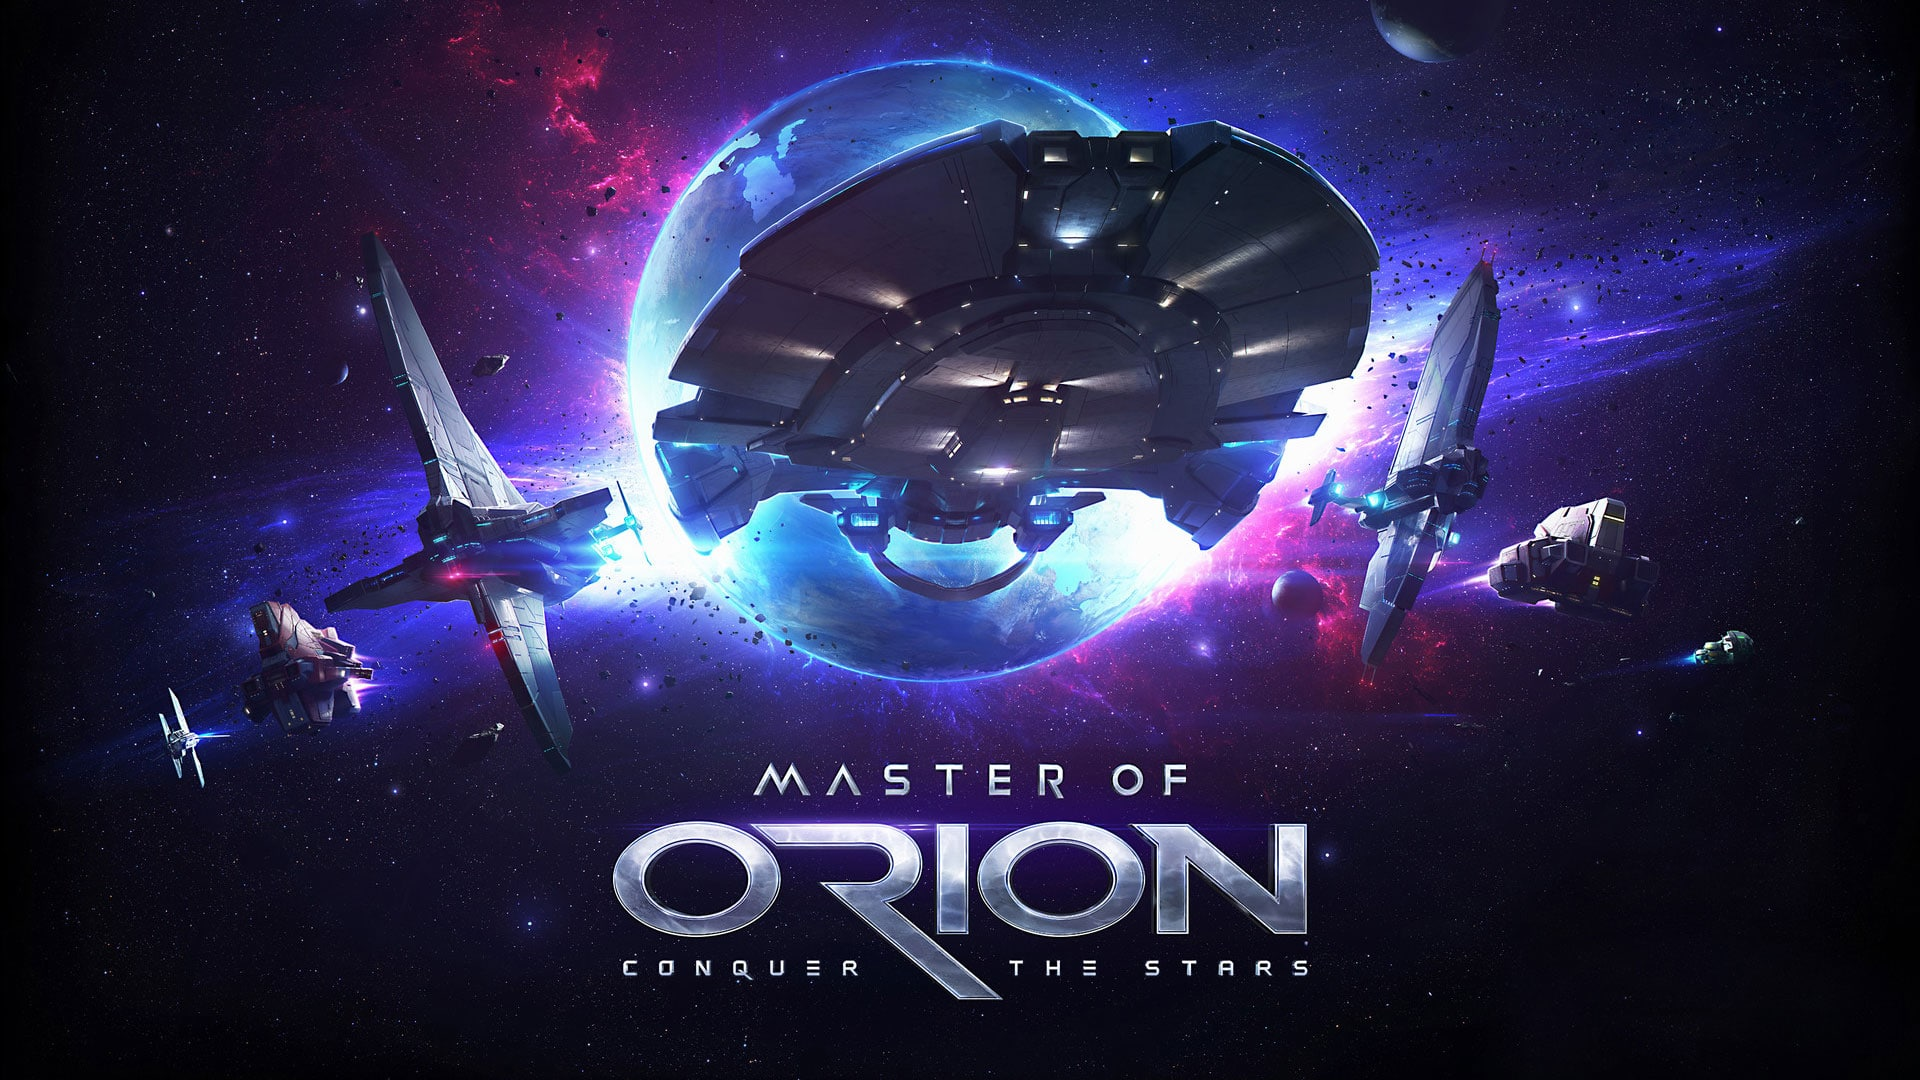 Master of Orion: Conquer The Stars za darmo za wygranie bitwy w World of Tanks 29